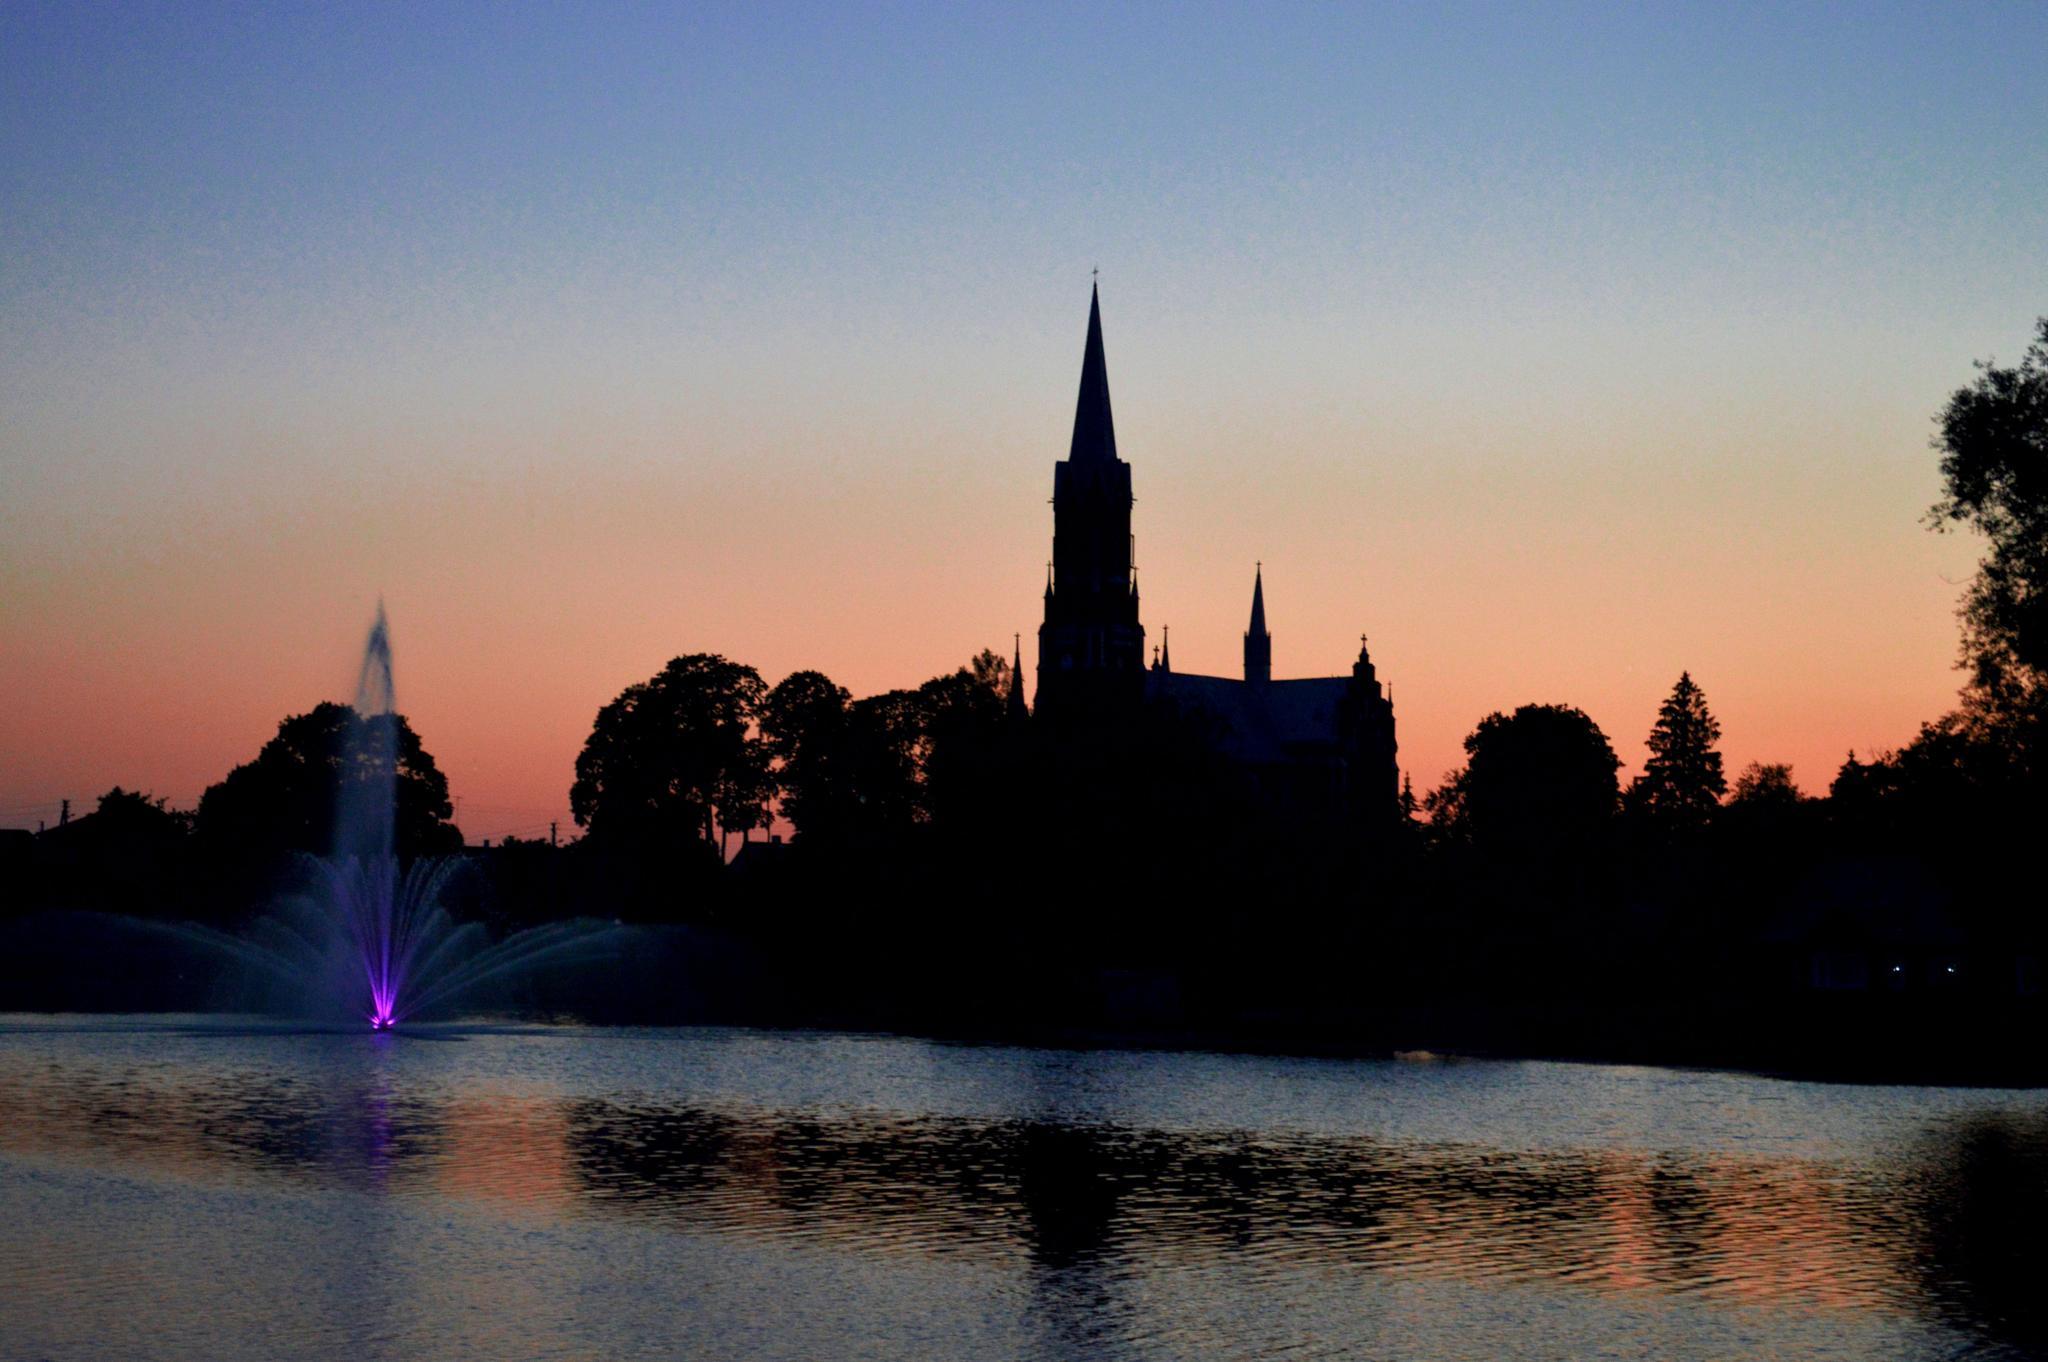 Church at night  by Moni Mon ( M&M Fotografija )